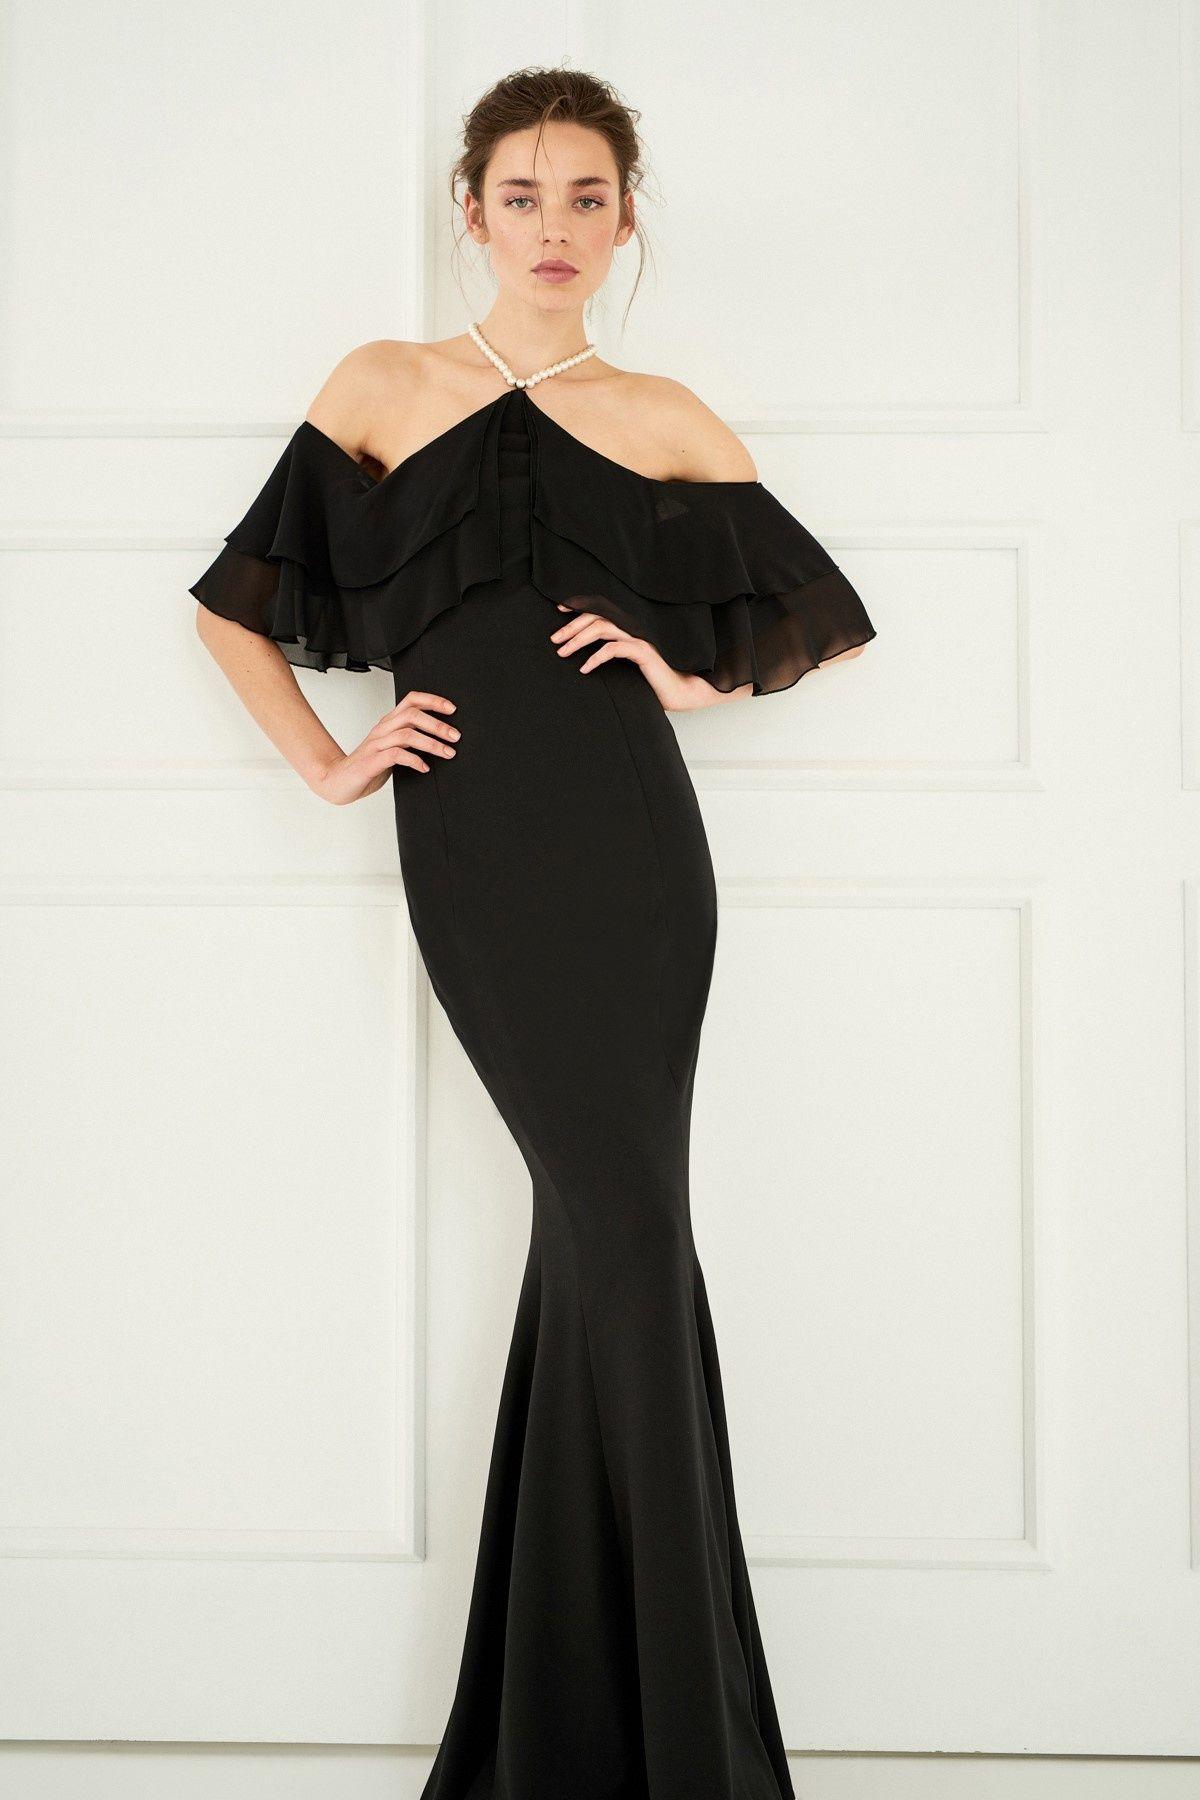 Siyah Incili Elbise Trendyolmilla Trendyol Elbise Elbise Modelleri The Dress